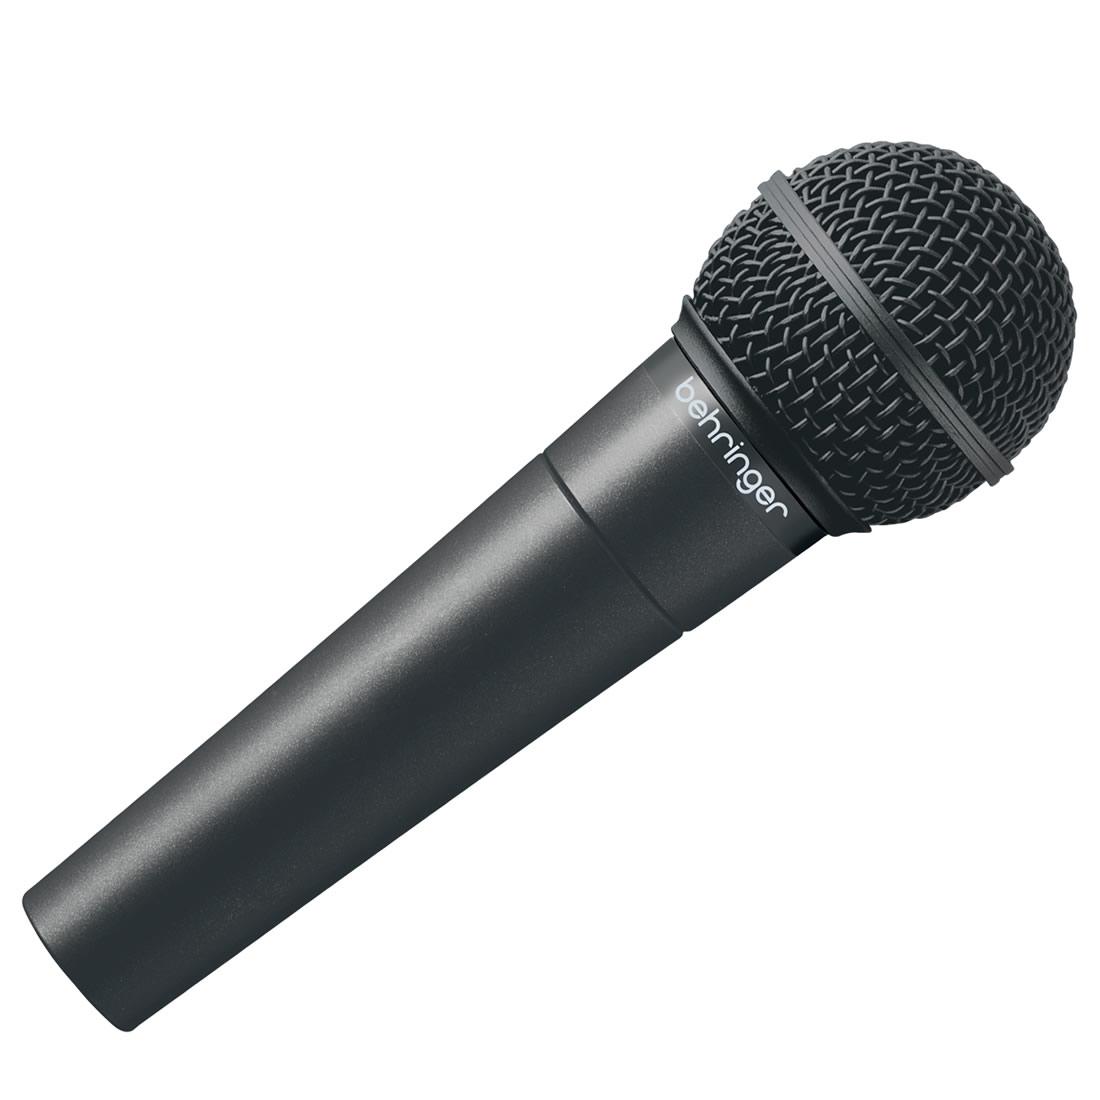 Behringer XM8500 Microfone Dinâmico Cardióide